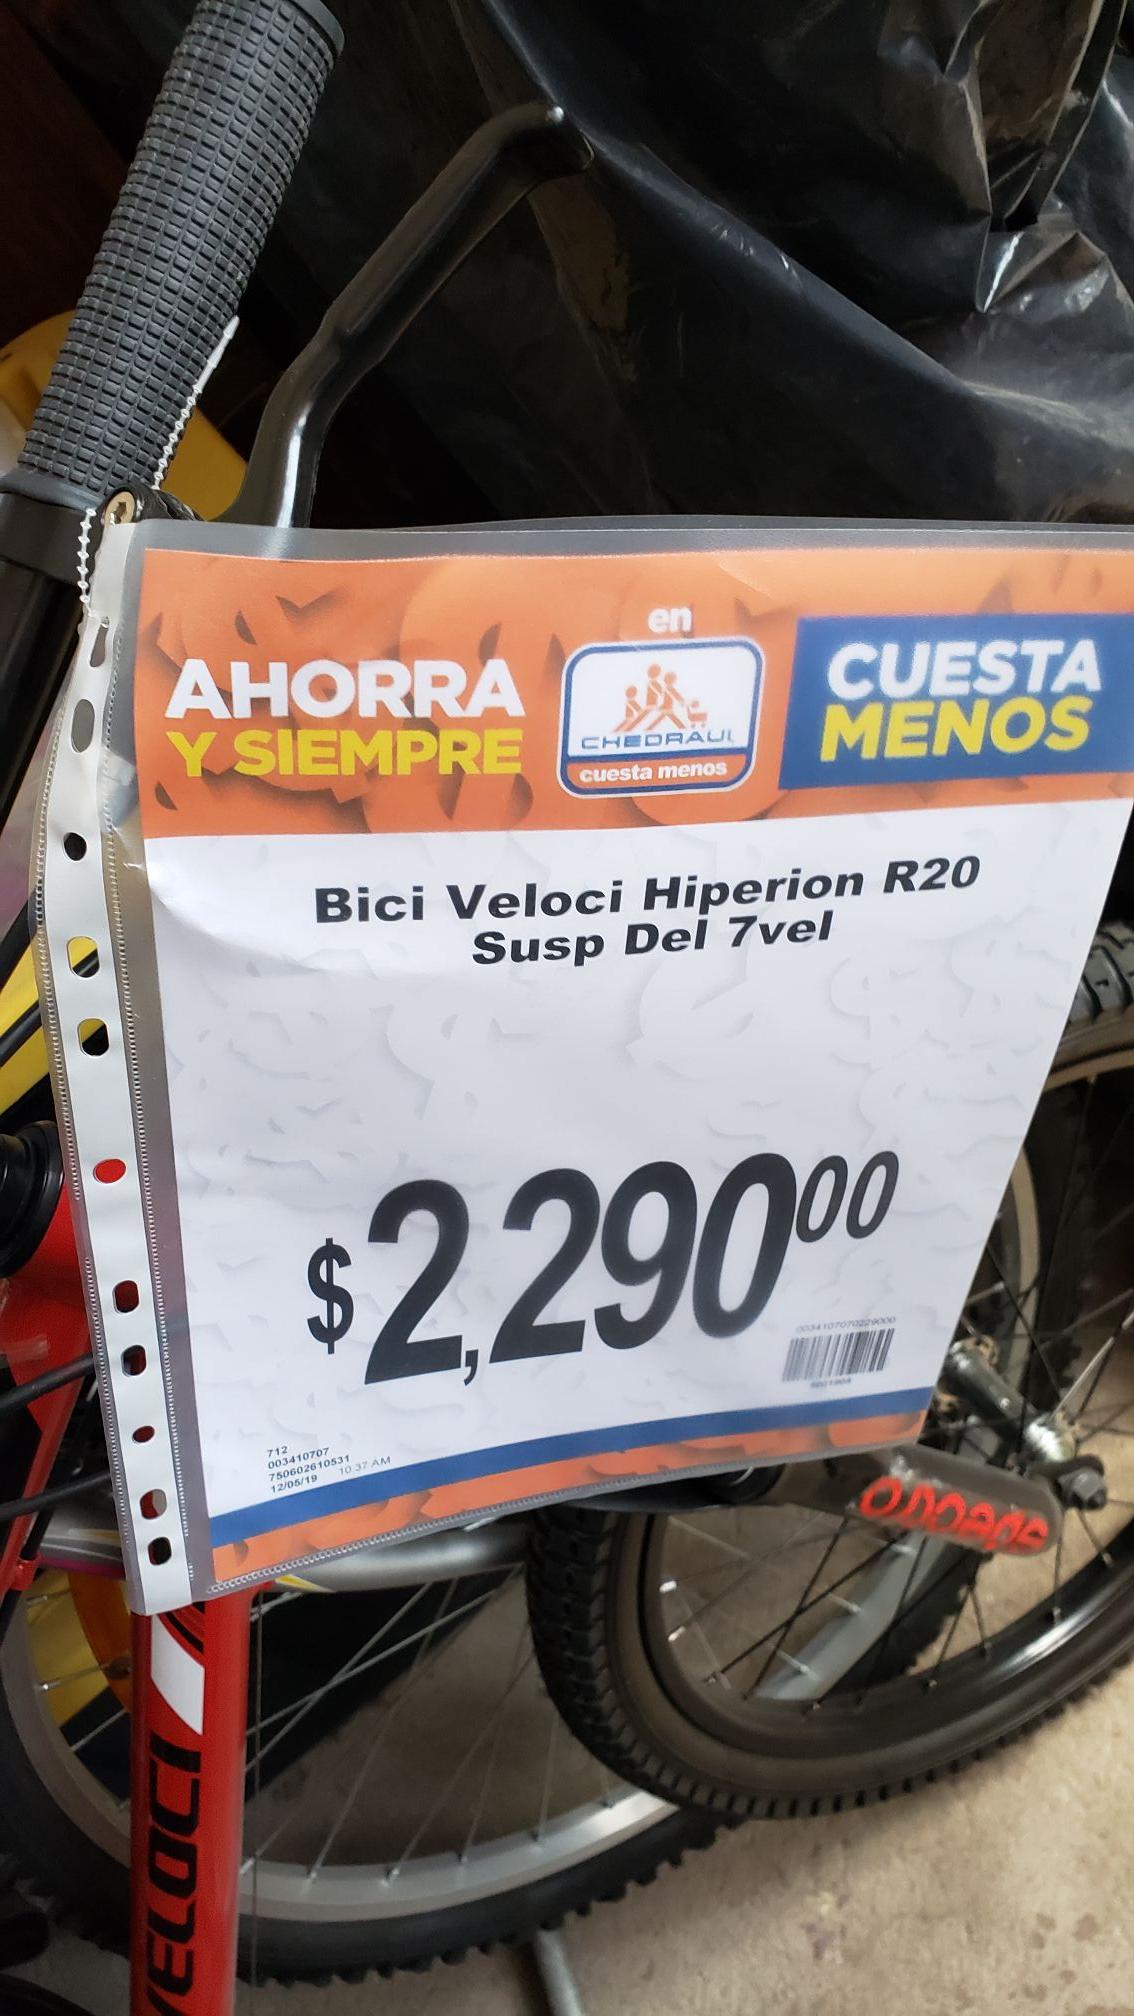 Chedraui: Bici R20 Susp Del 7 Vel